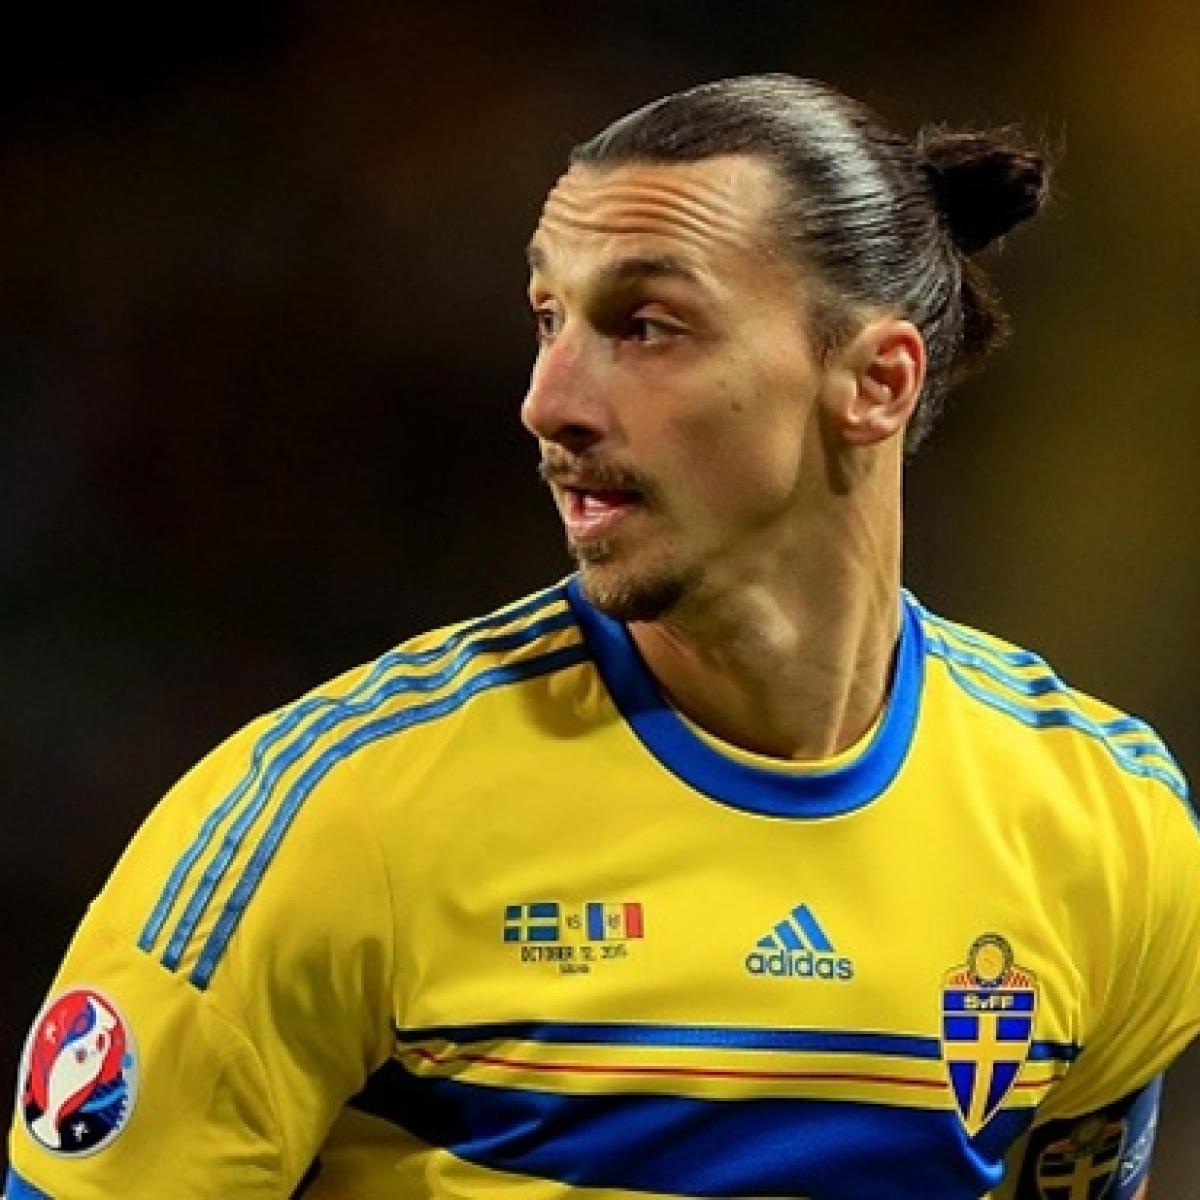 Swedish footballer Zlatan Ibrahimovic files 'hate crime' complaint